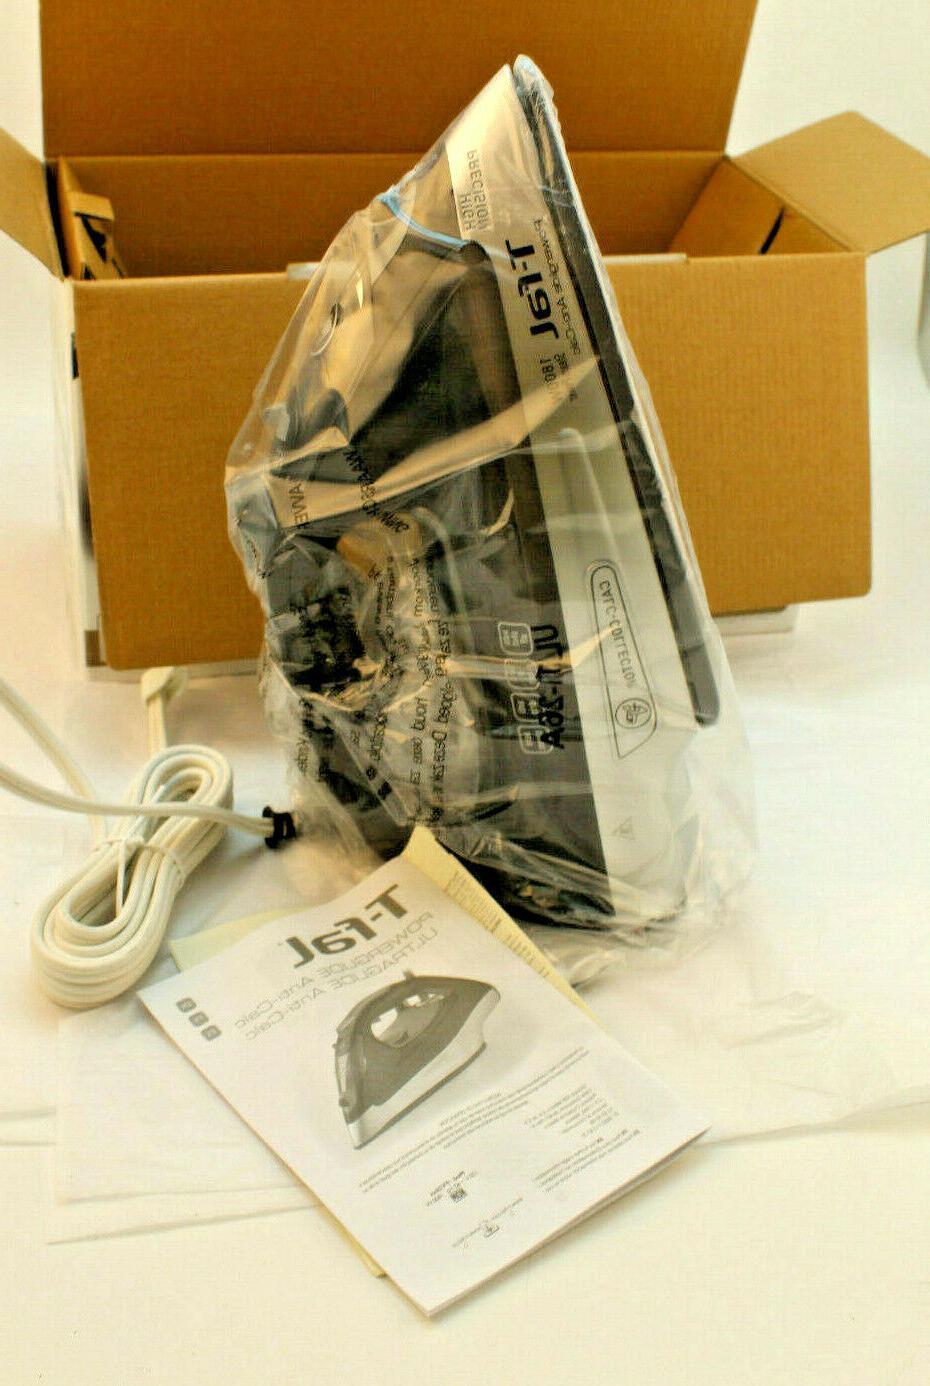 T-FAL Anticalc Iron RETAIL $99